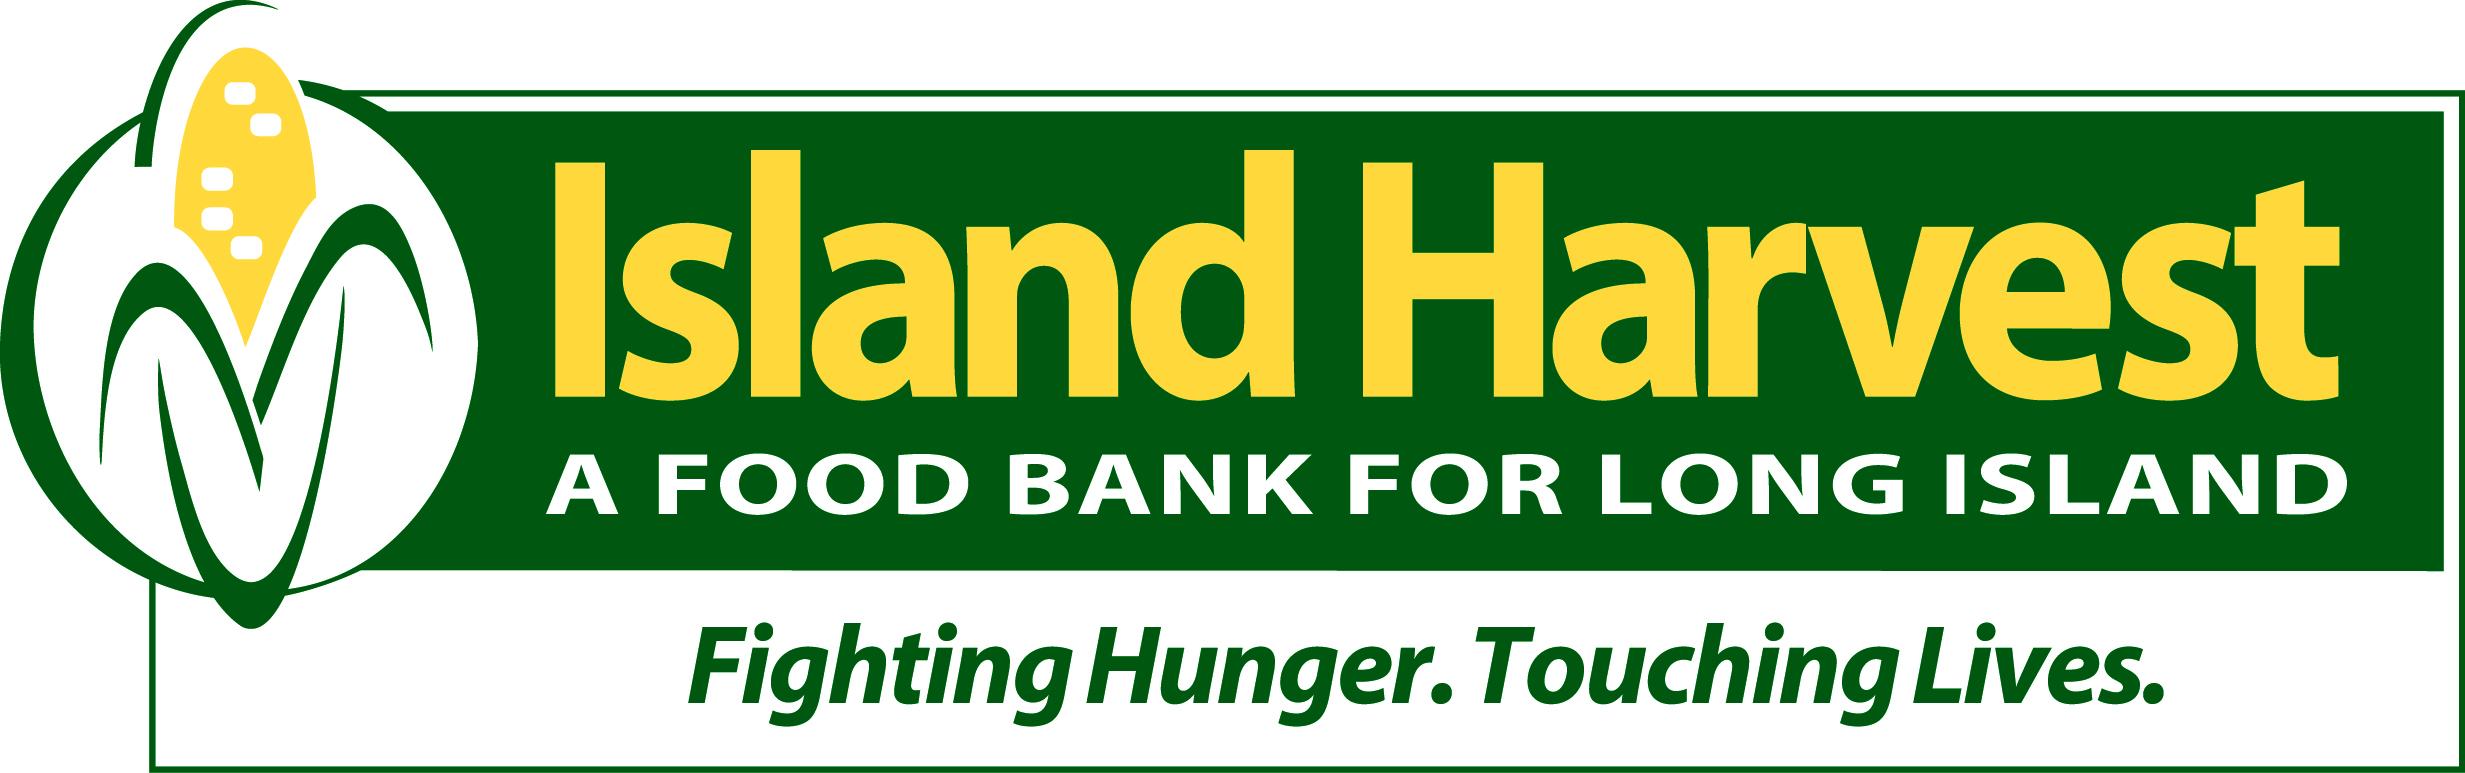 Island Harvest-Logo-LG_4color-REV-high-res.jpg